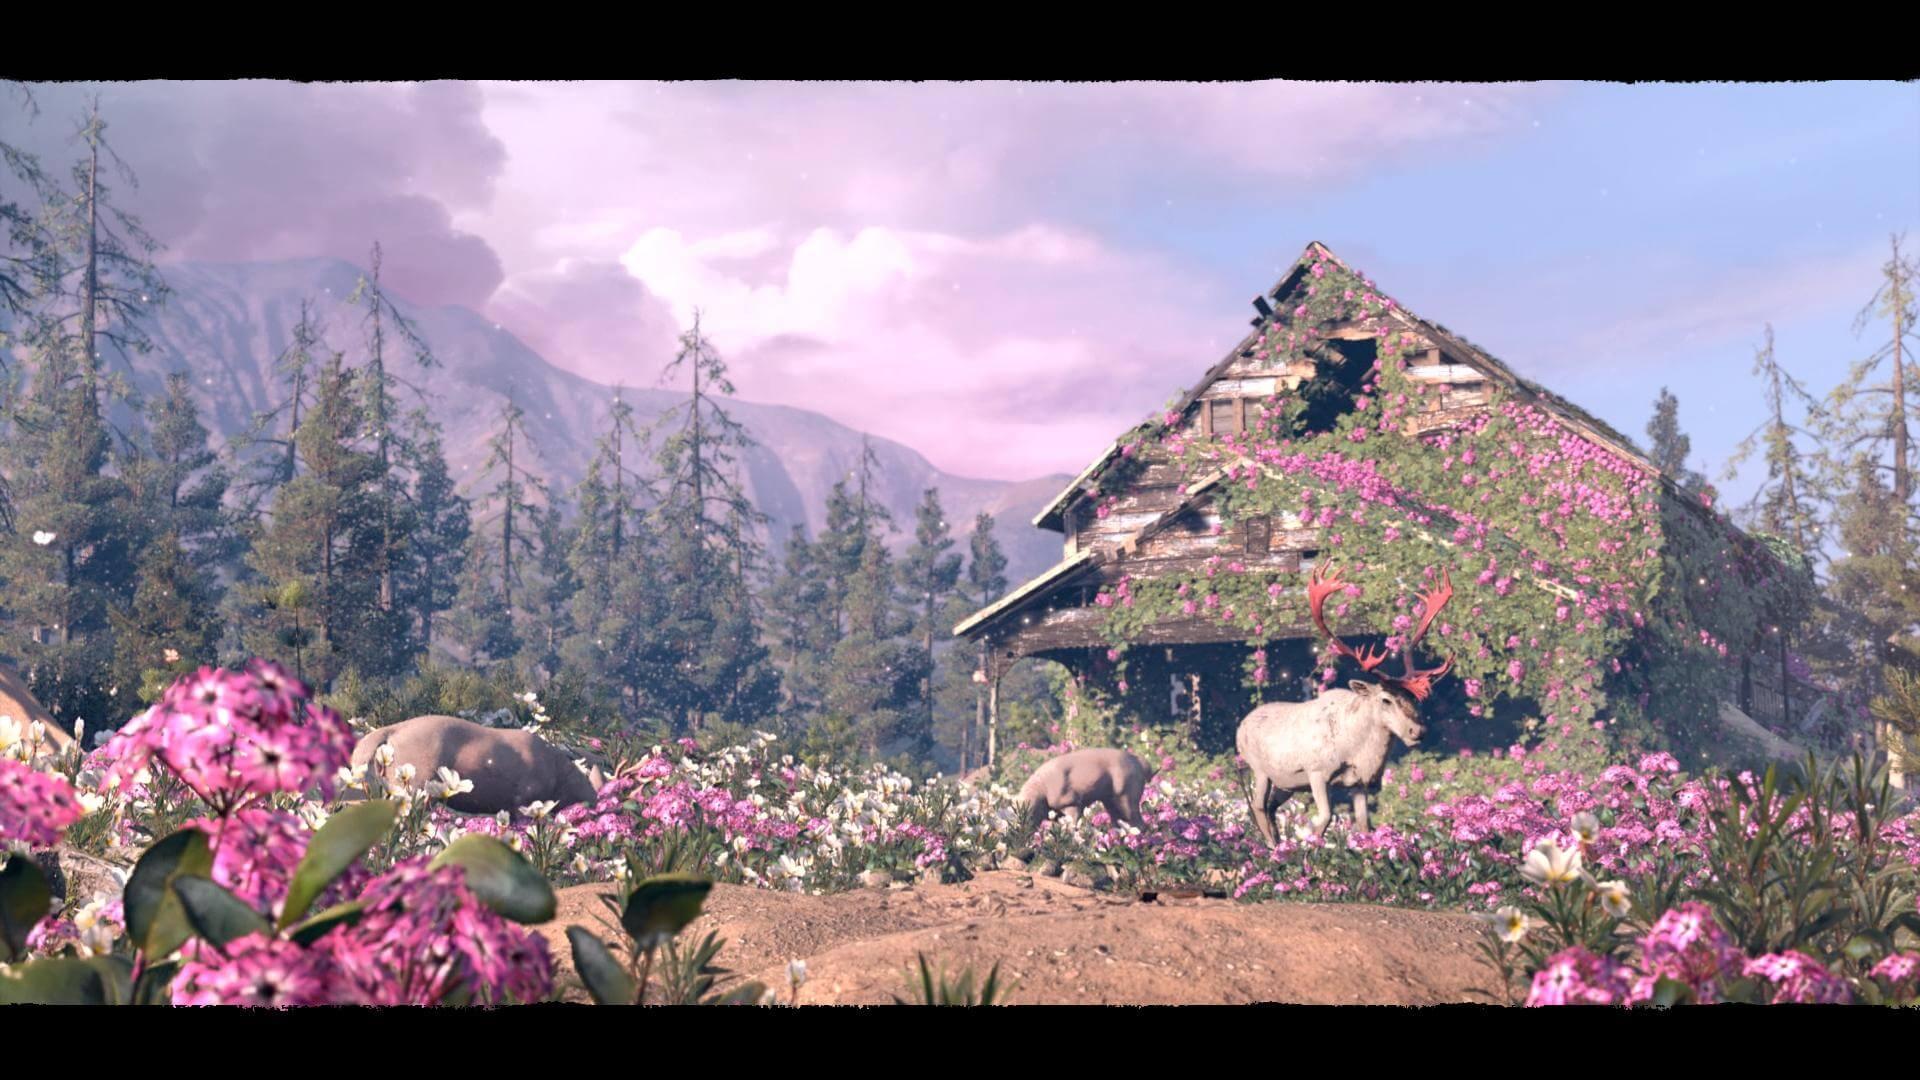 Far Cry New Dawn Wallpapers Top Free Far Cry New Dawn